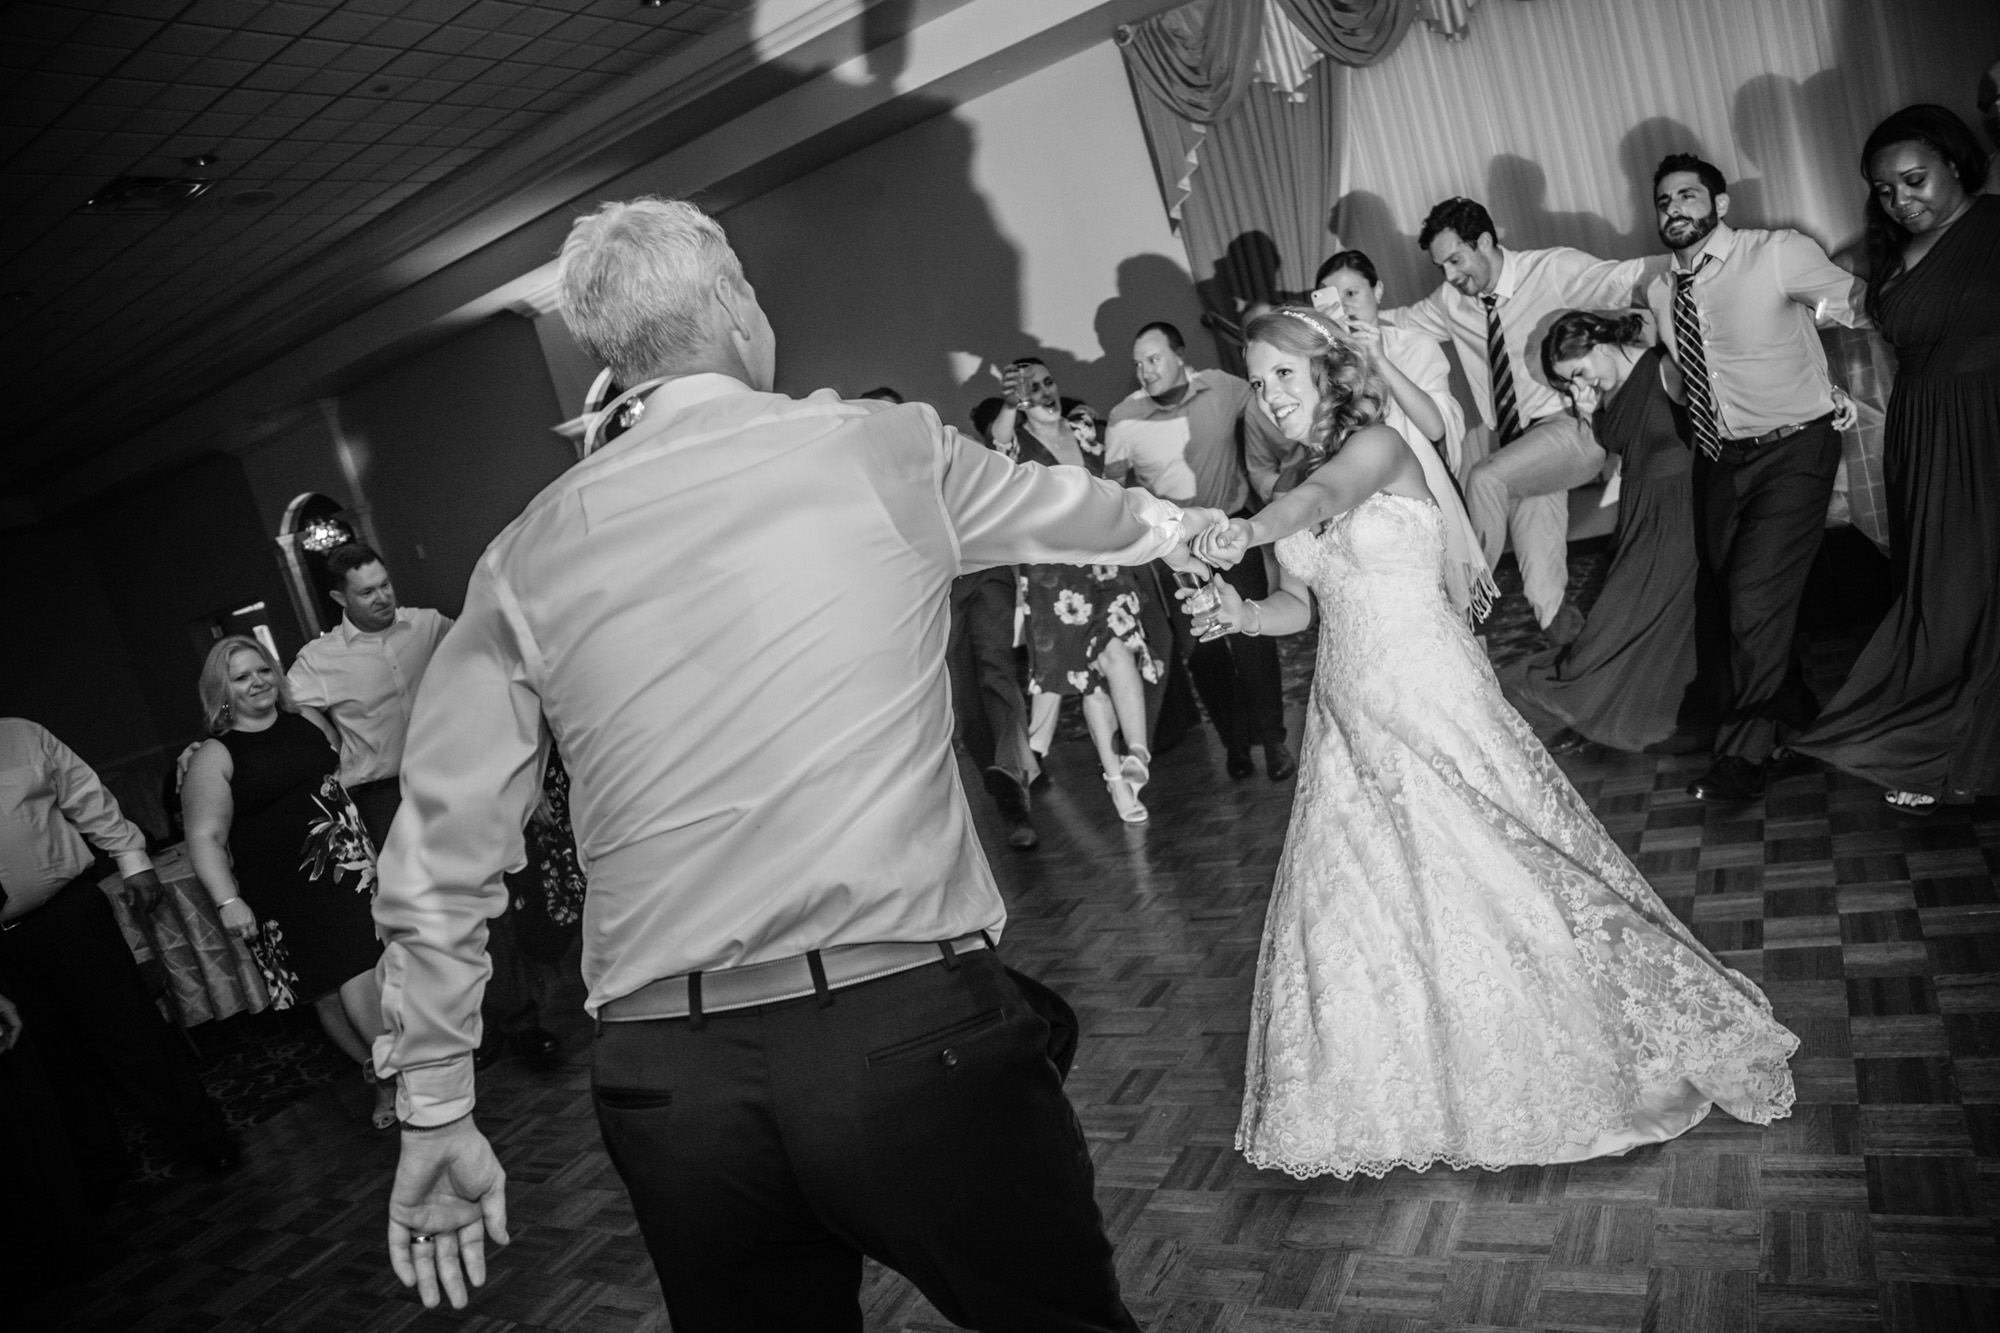 scranton_wedding_photographer_lettieri_pa (47 of 47).jpg